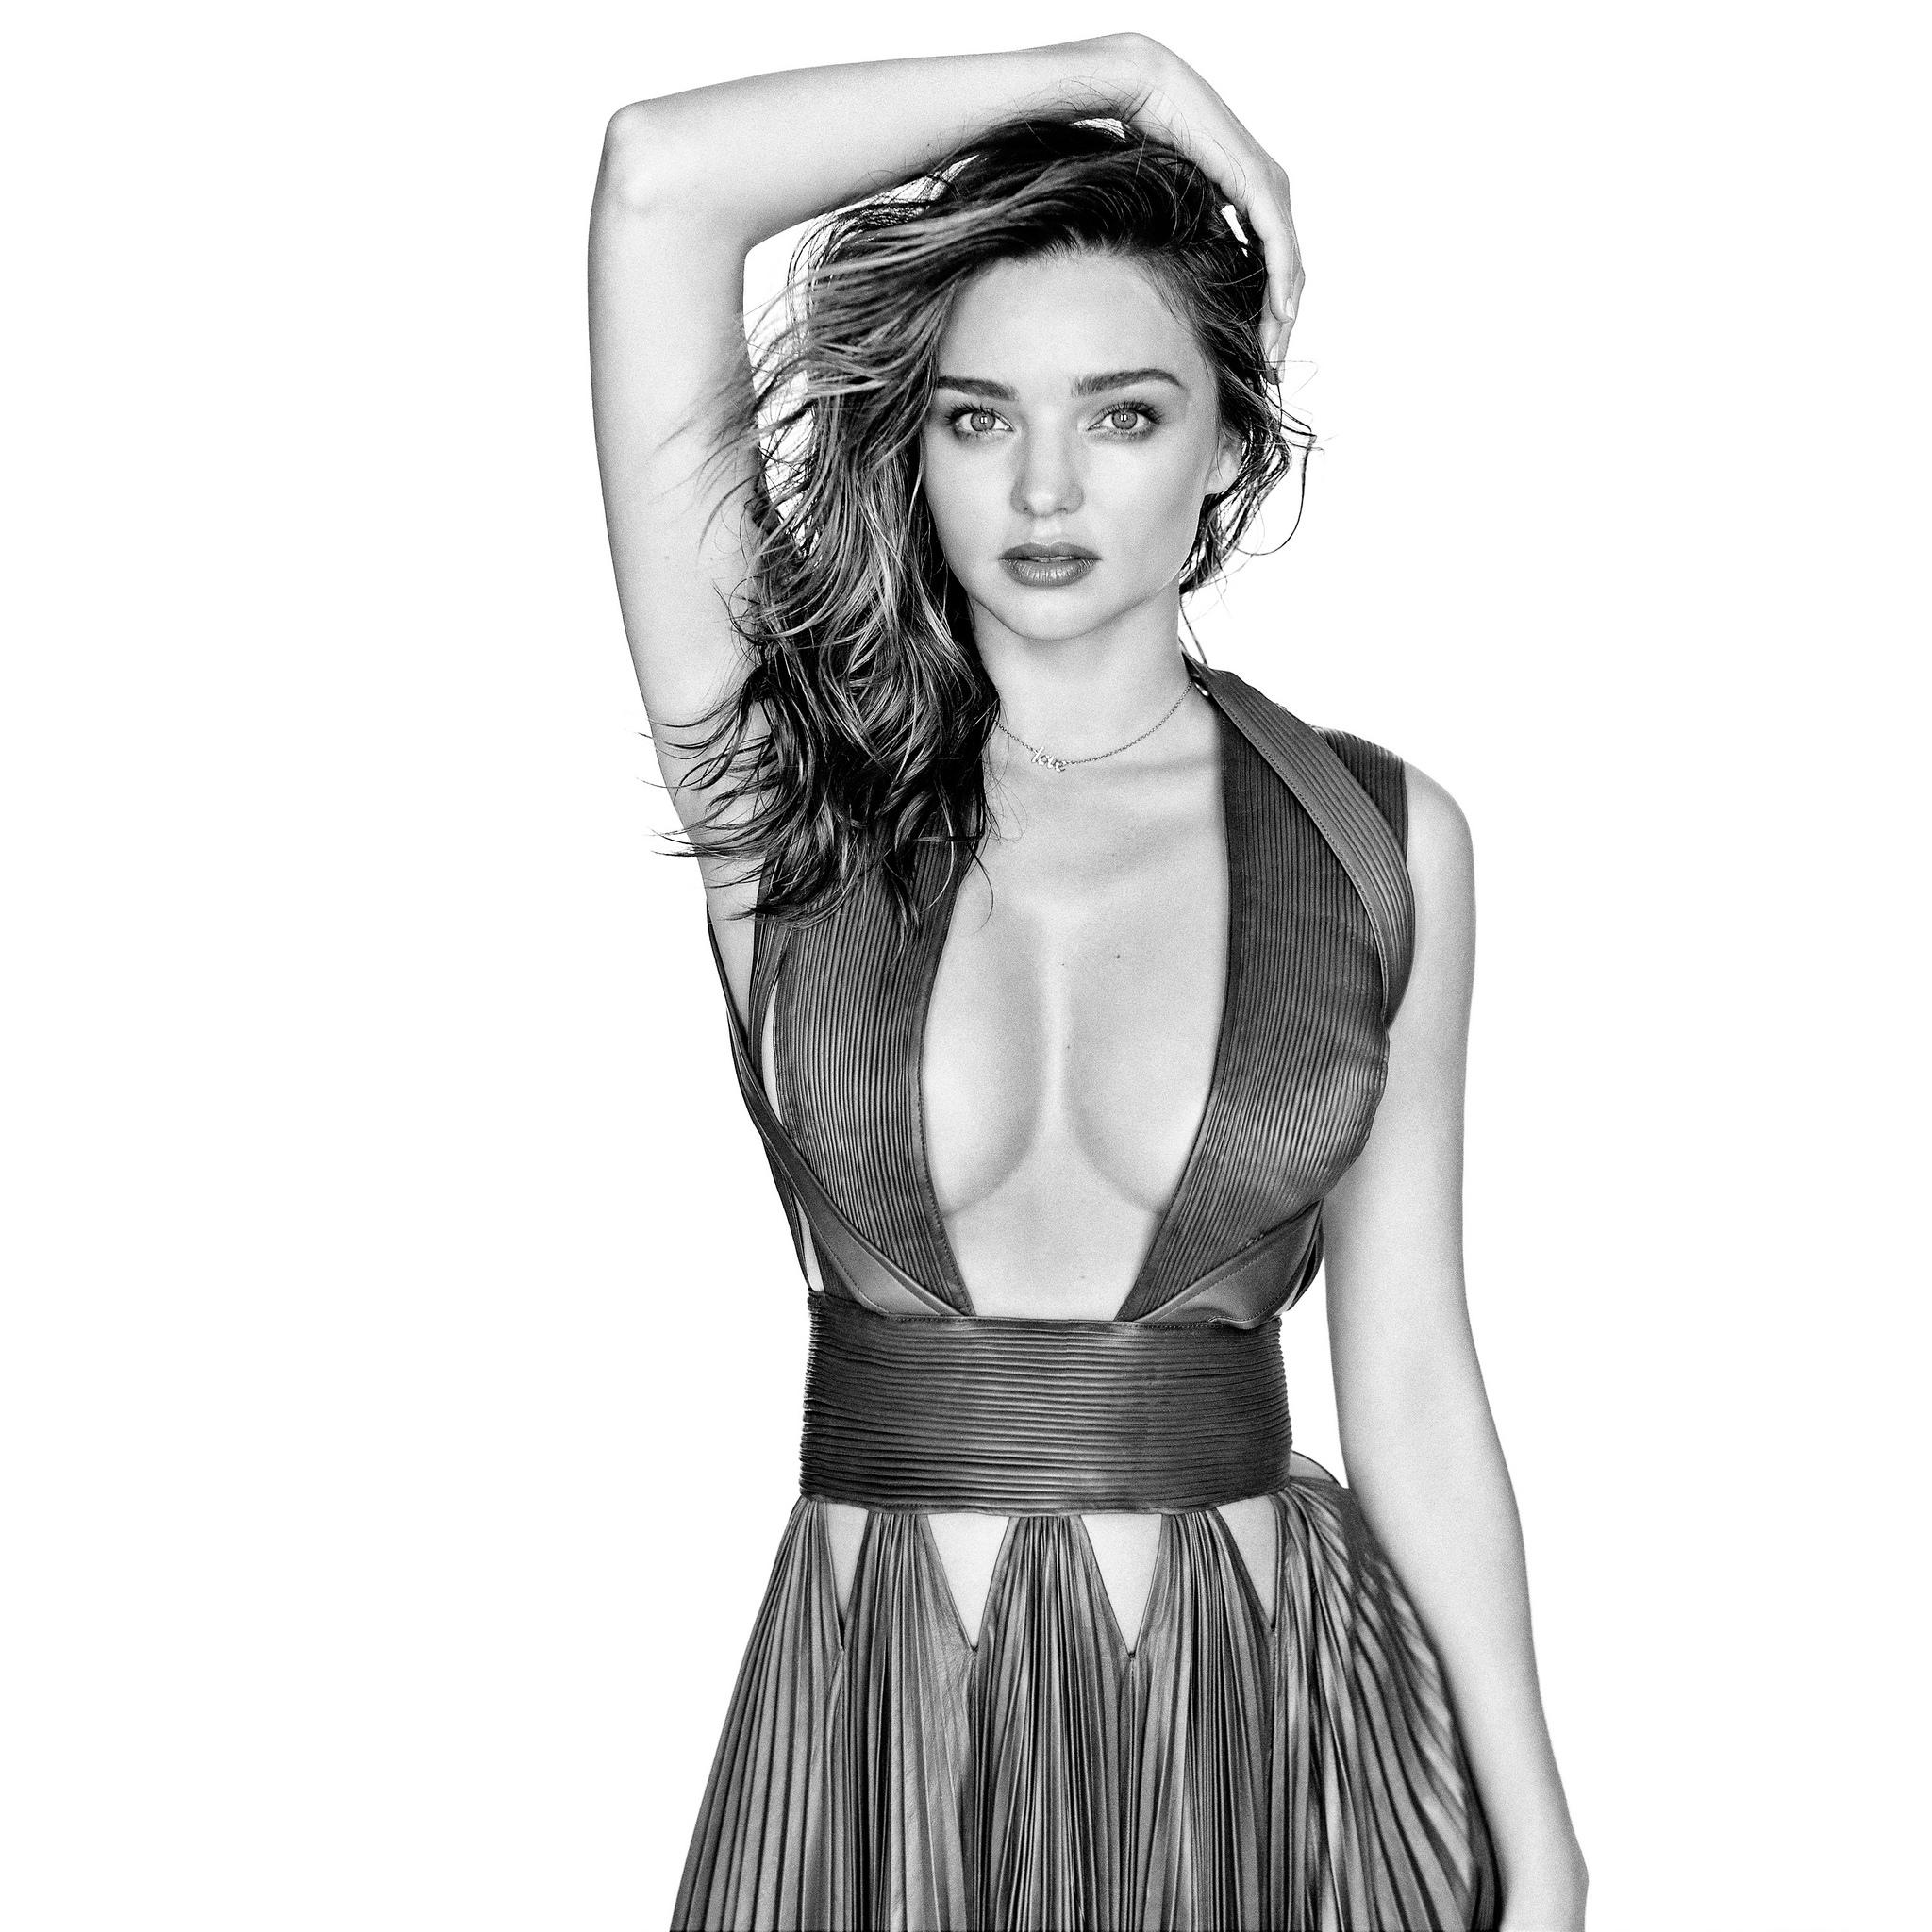 Miranda Kerr - Page 1374 - Female Fashion Models - Bellazon Miranda Kerr Bellazon